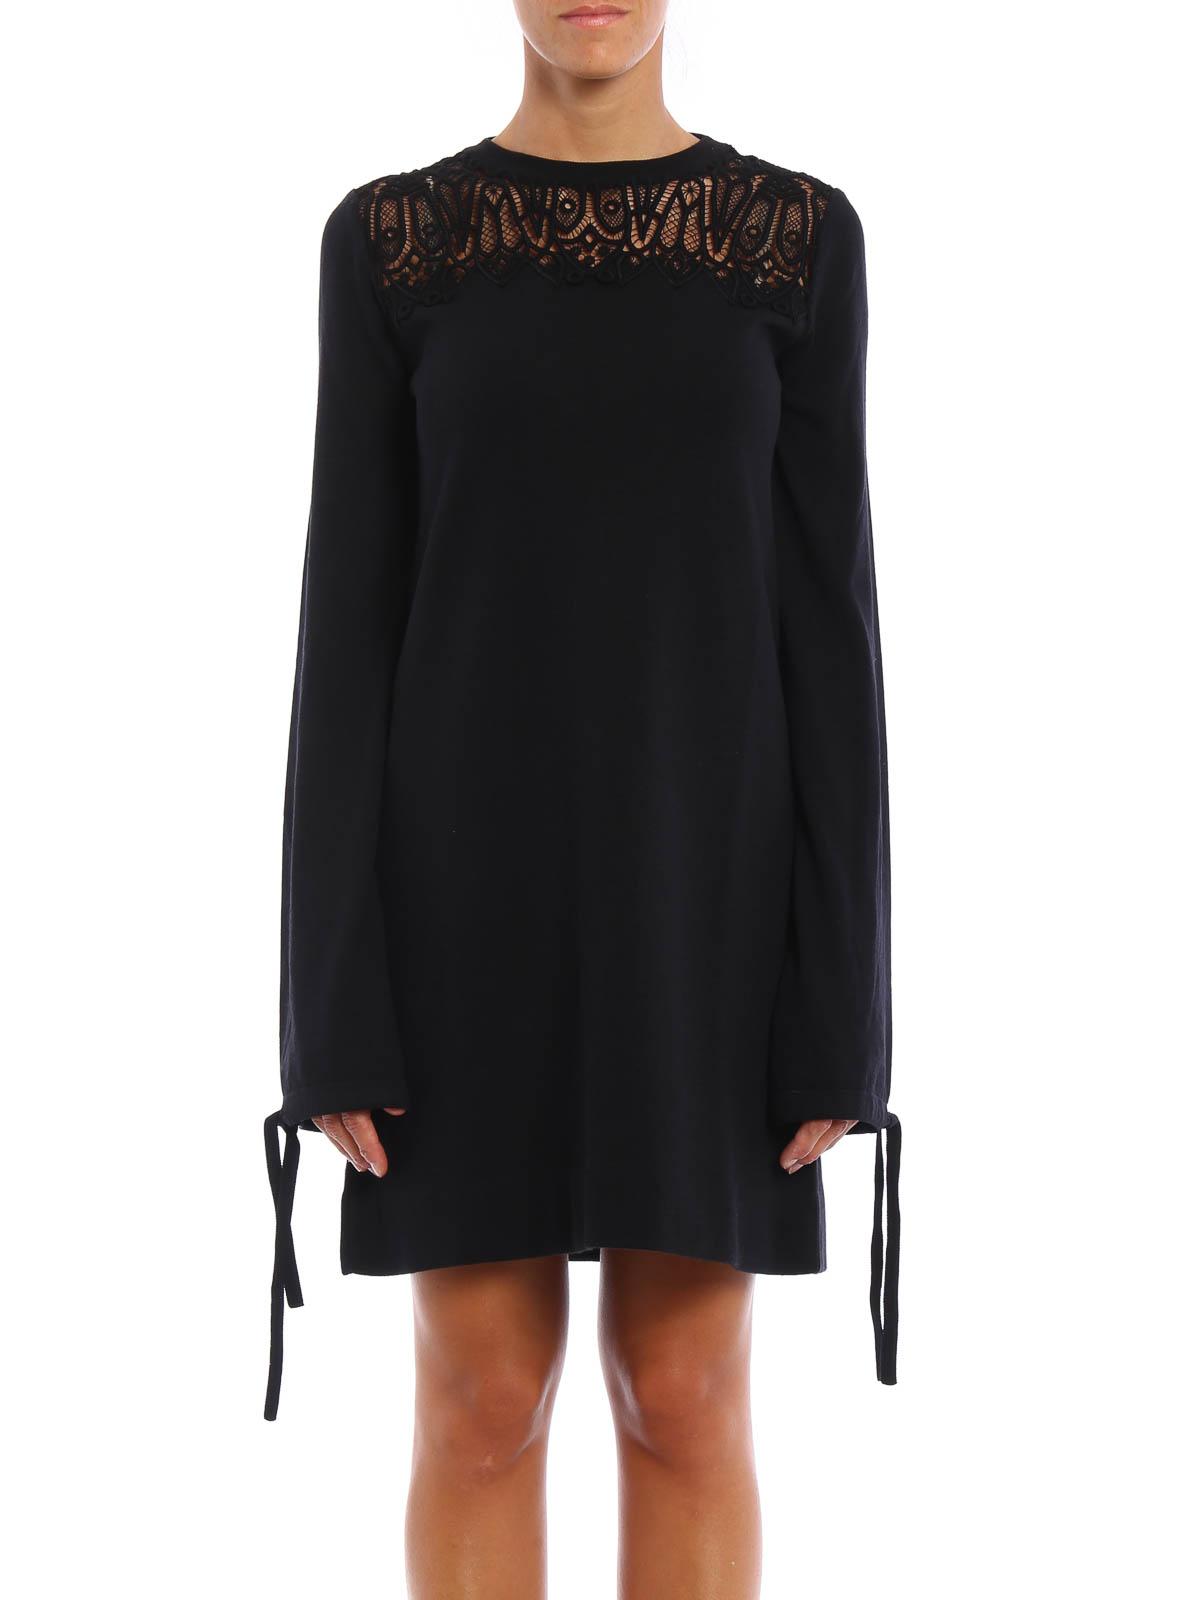 Chloe Lace Details Short Dress Short Dresses 16amr11